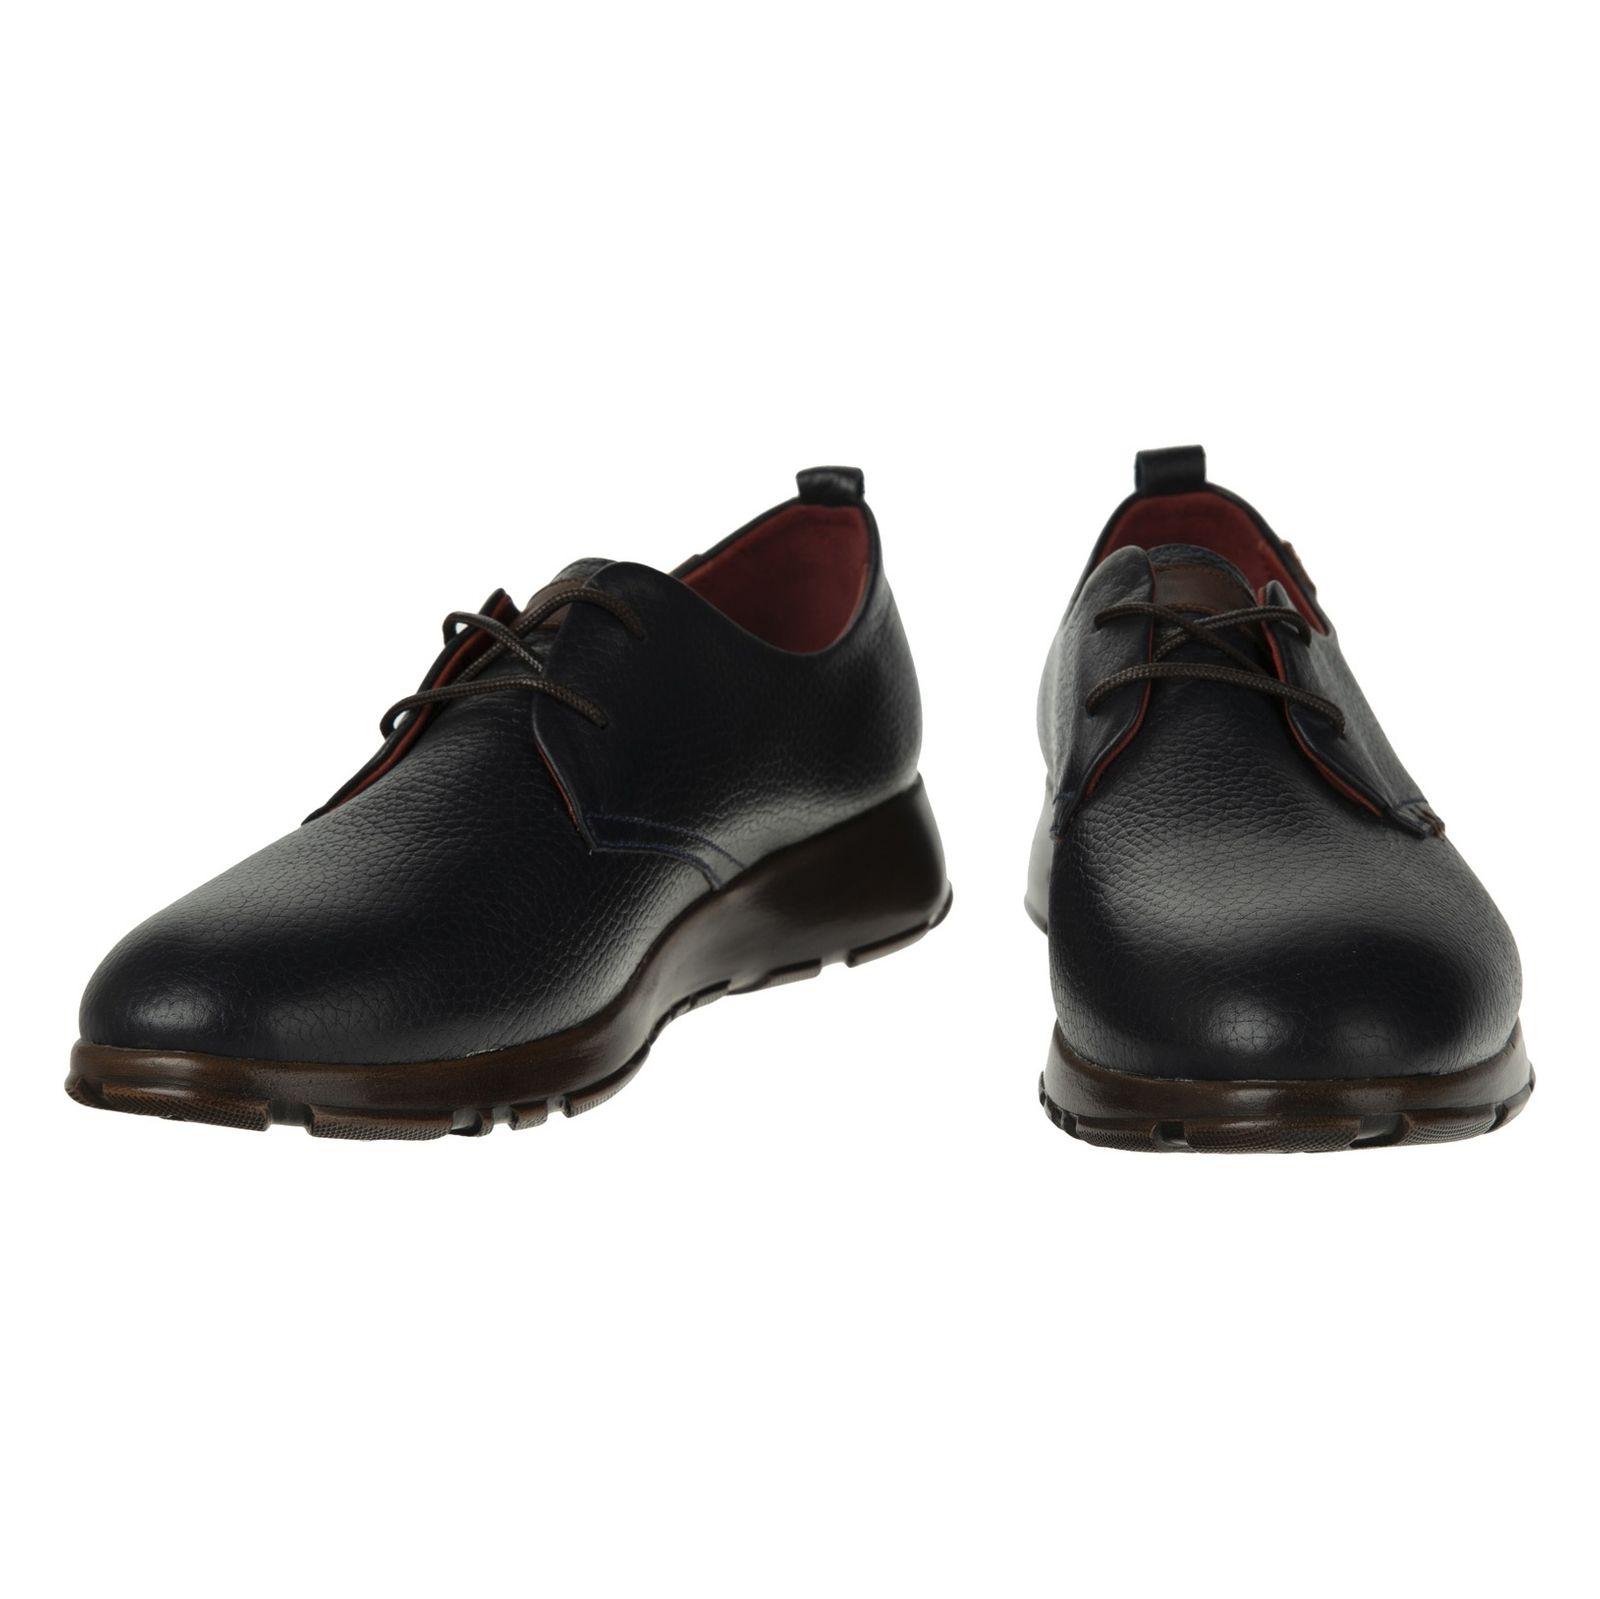 کفش روزمره زنانه ساتین مدل SN5184A-103 -  - 3